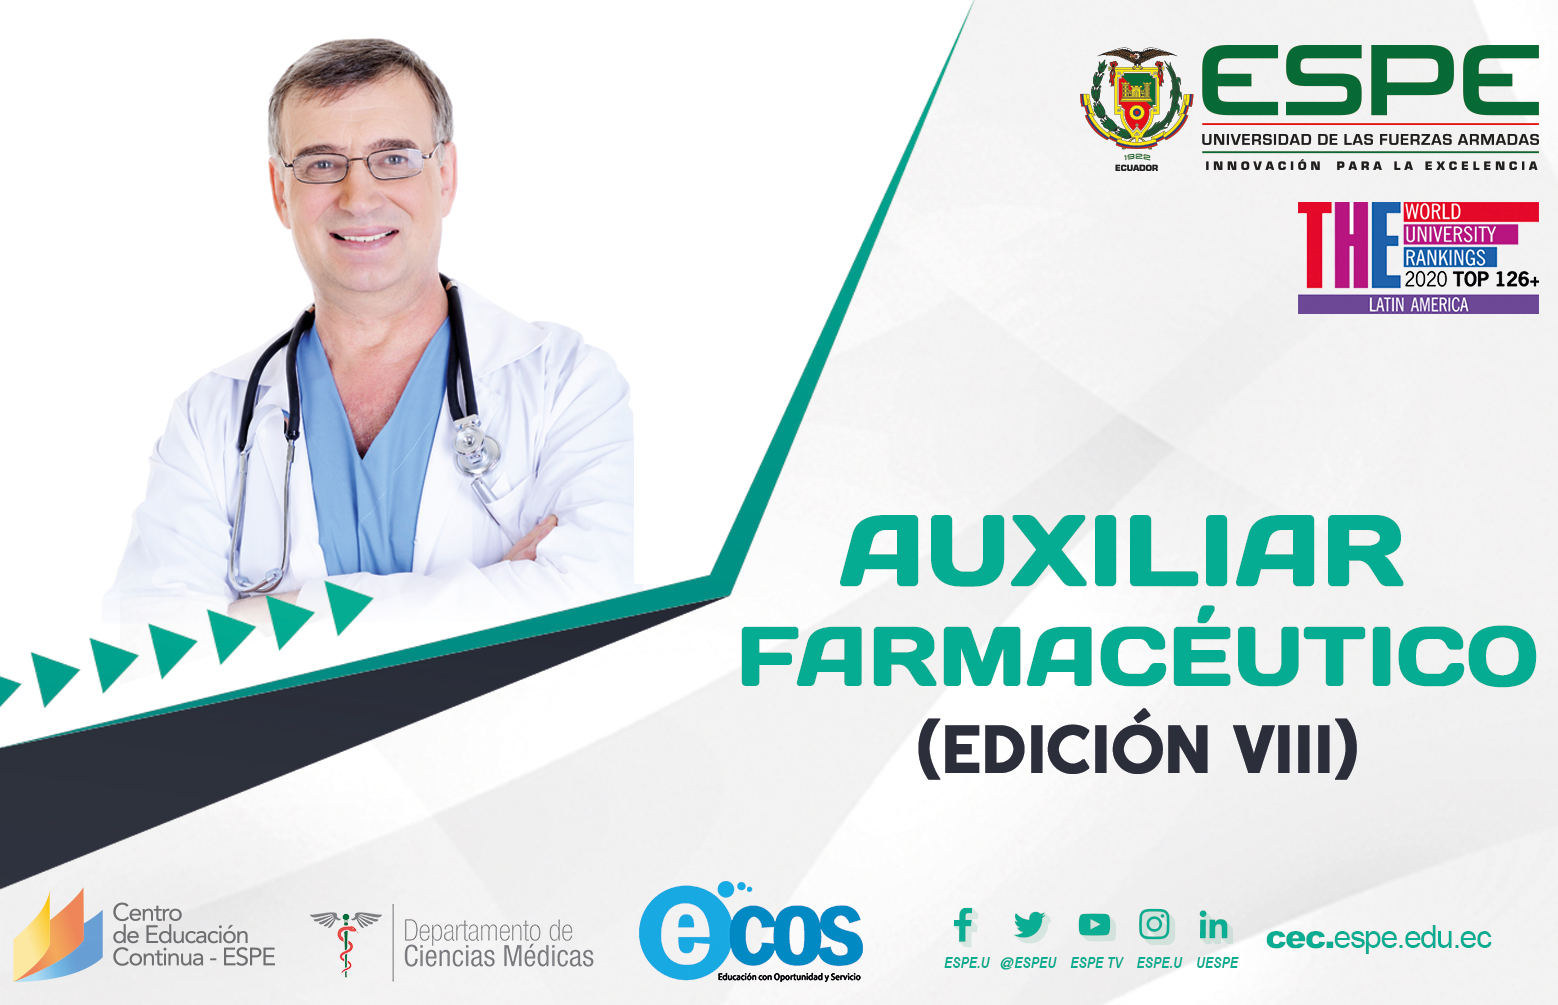 Auxiliar Farmacéutico (Edición VIII)